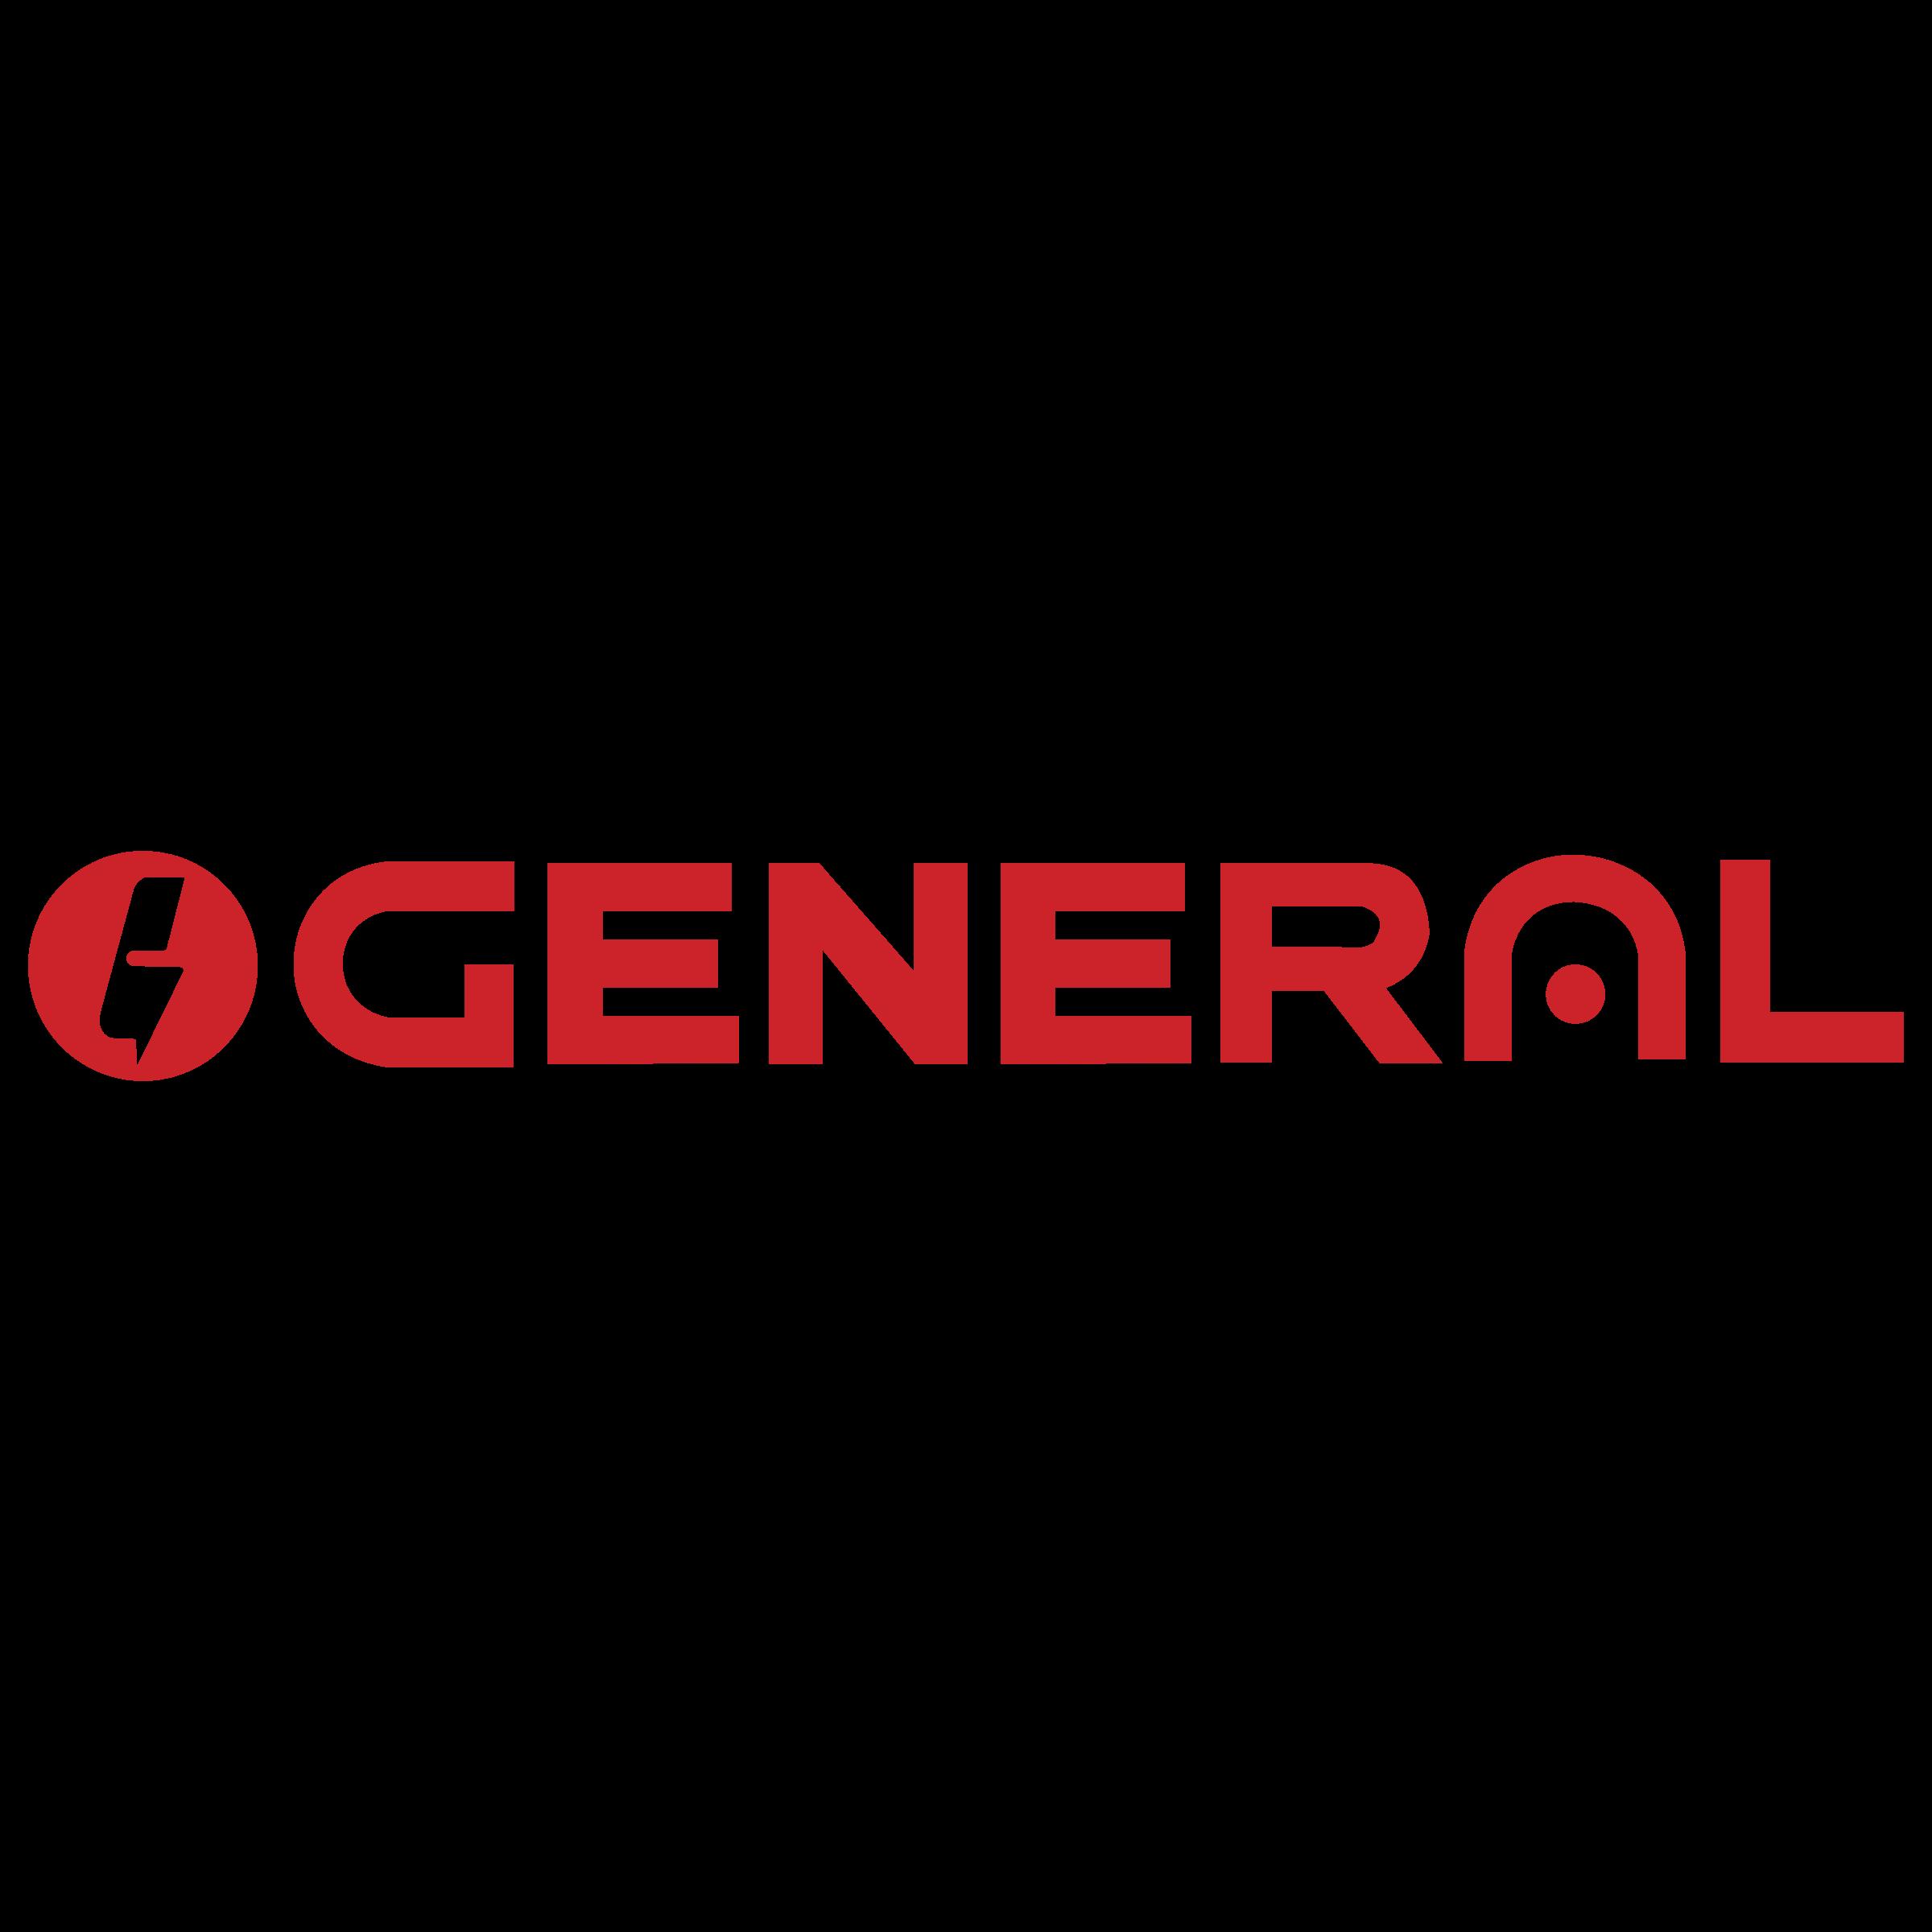 general-logo-png-transparent